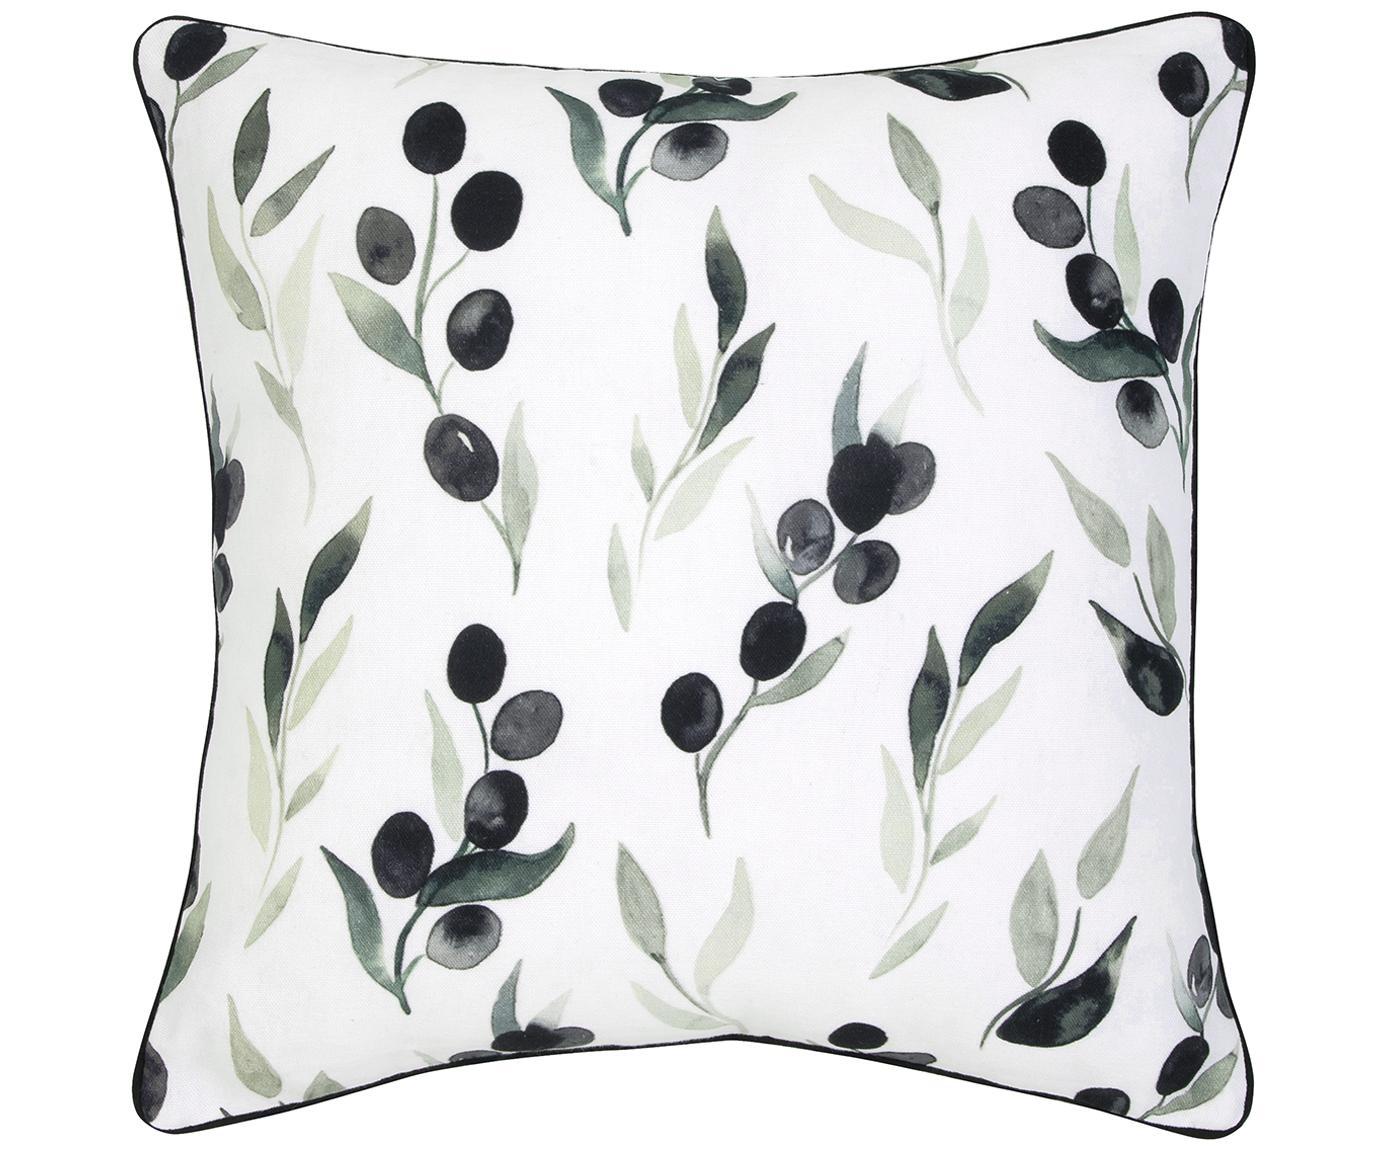 Federa arredo Oliva, Cotone, Bianco, grigio scuro, verde bordatura in pelle: grigio scuro, Larg. 40 x Lung. 40 cm